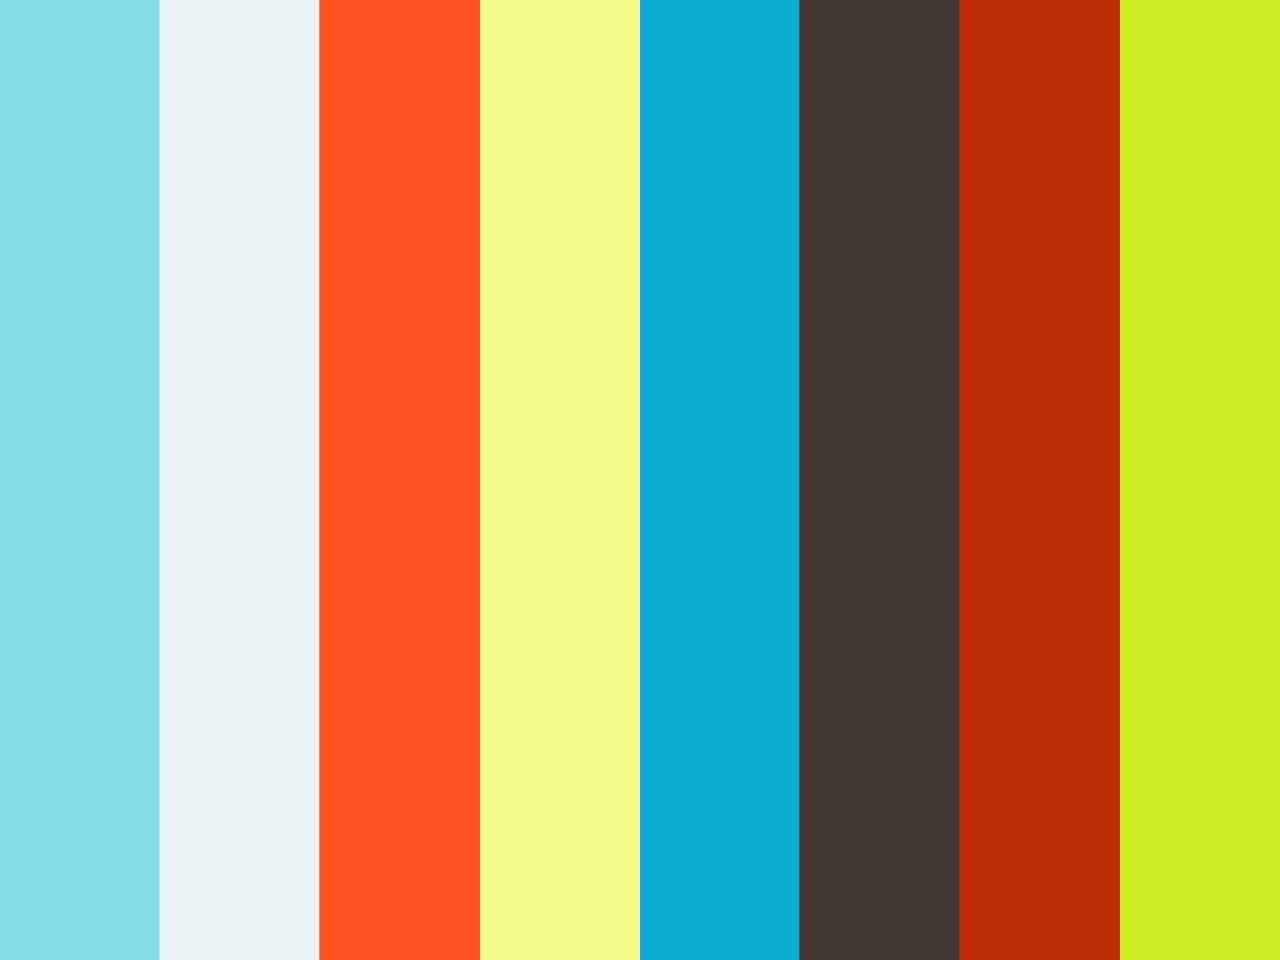 002917 - SNTV - word stadsmodel